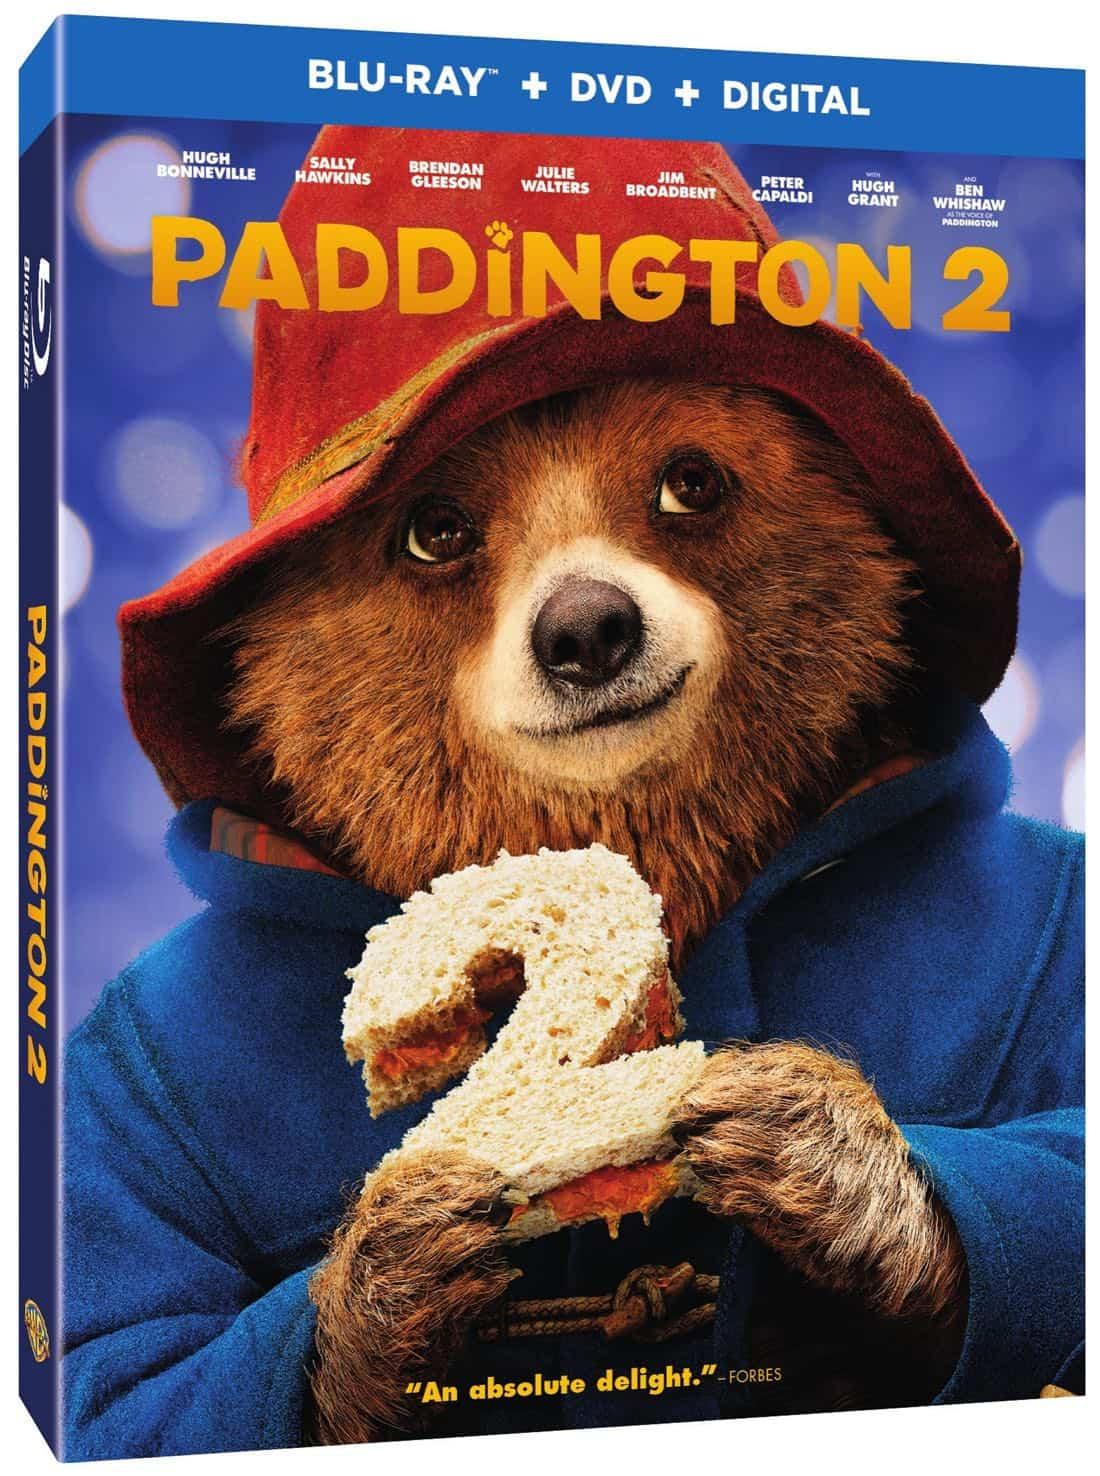 Paddington-2-Bluray-DVD-Digital